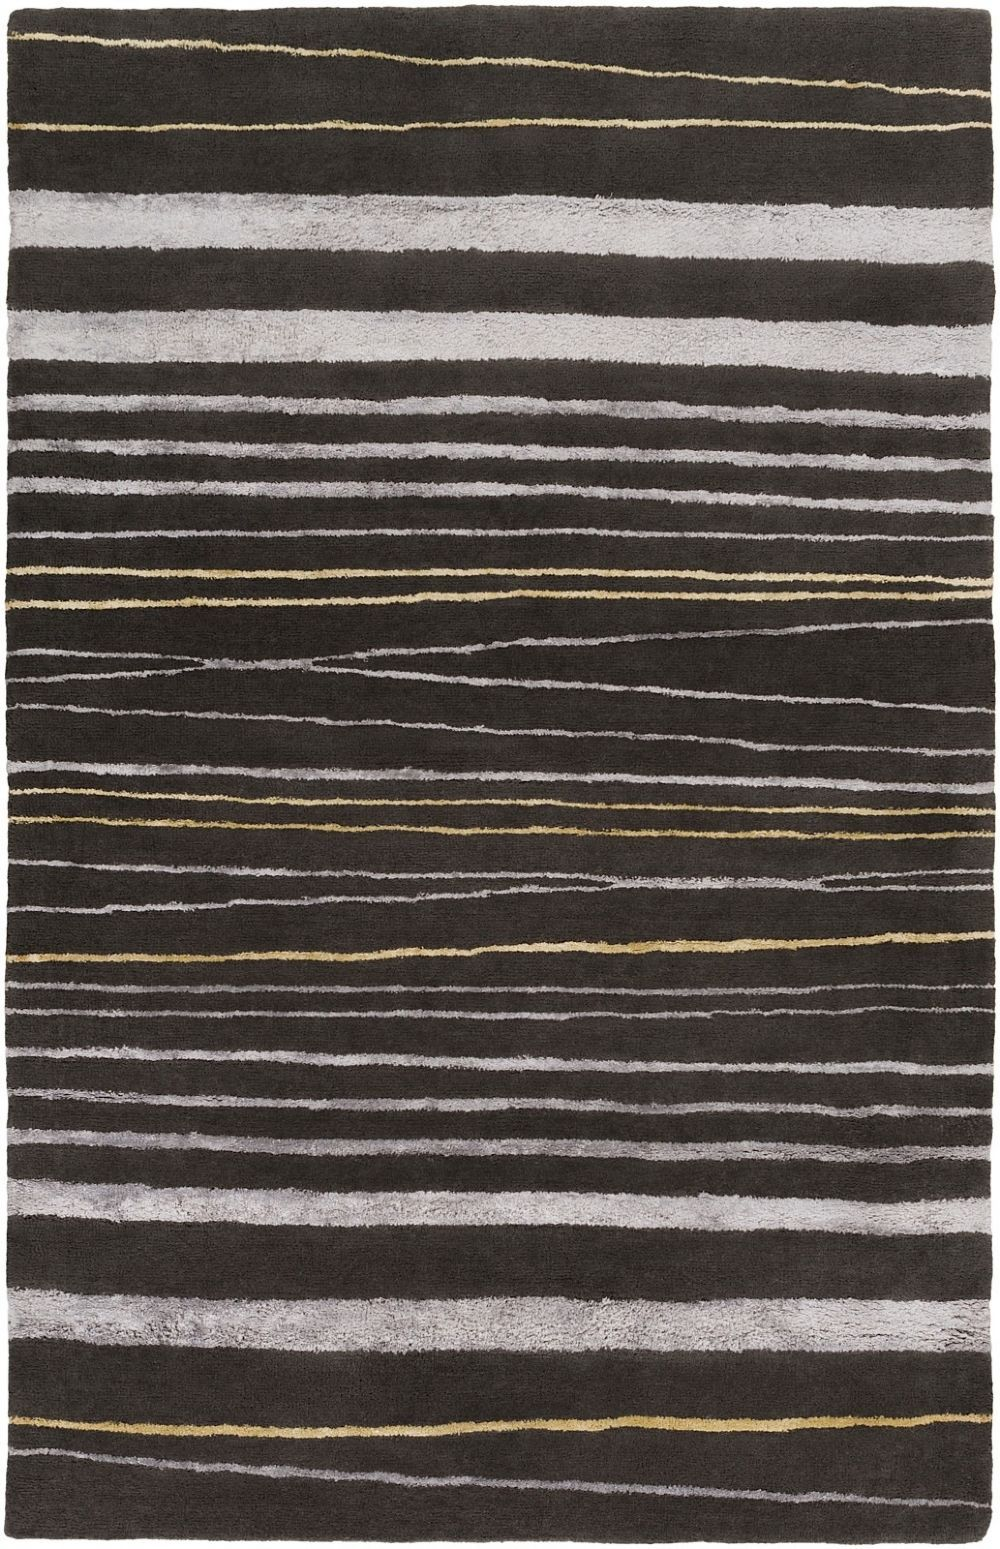 Surya Manor Contemporary Area Rug Collection  #rugs  #homedecor #interior #homefurnishing